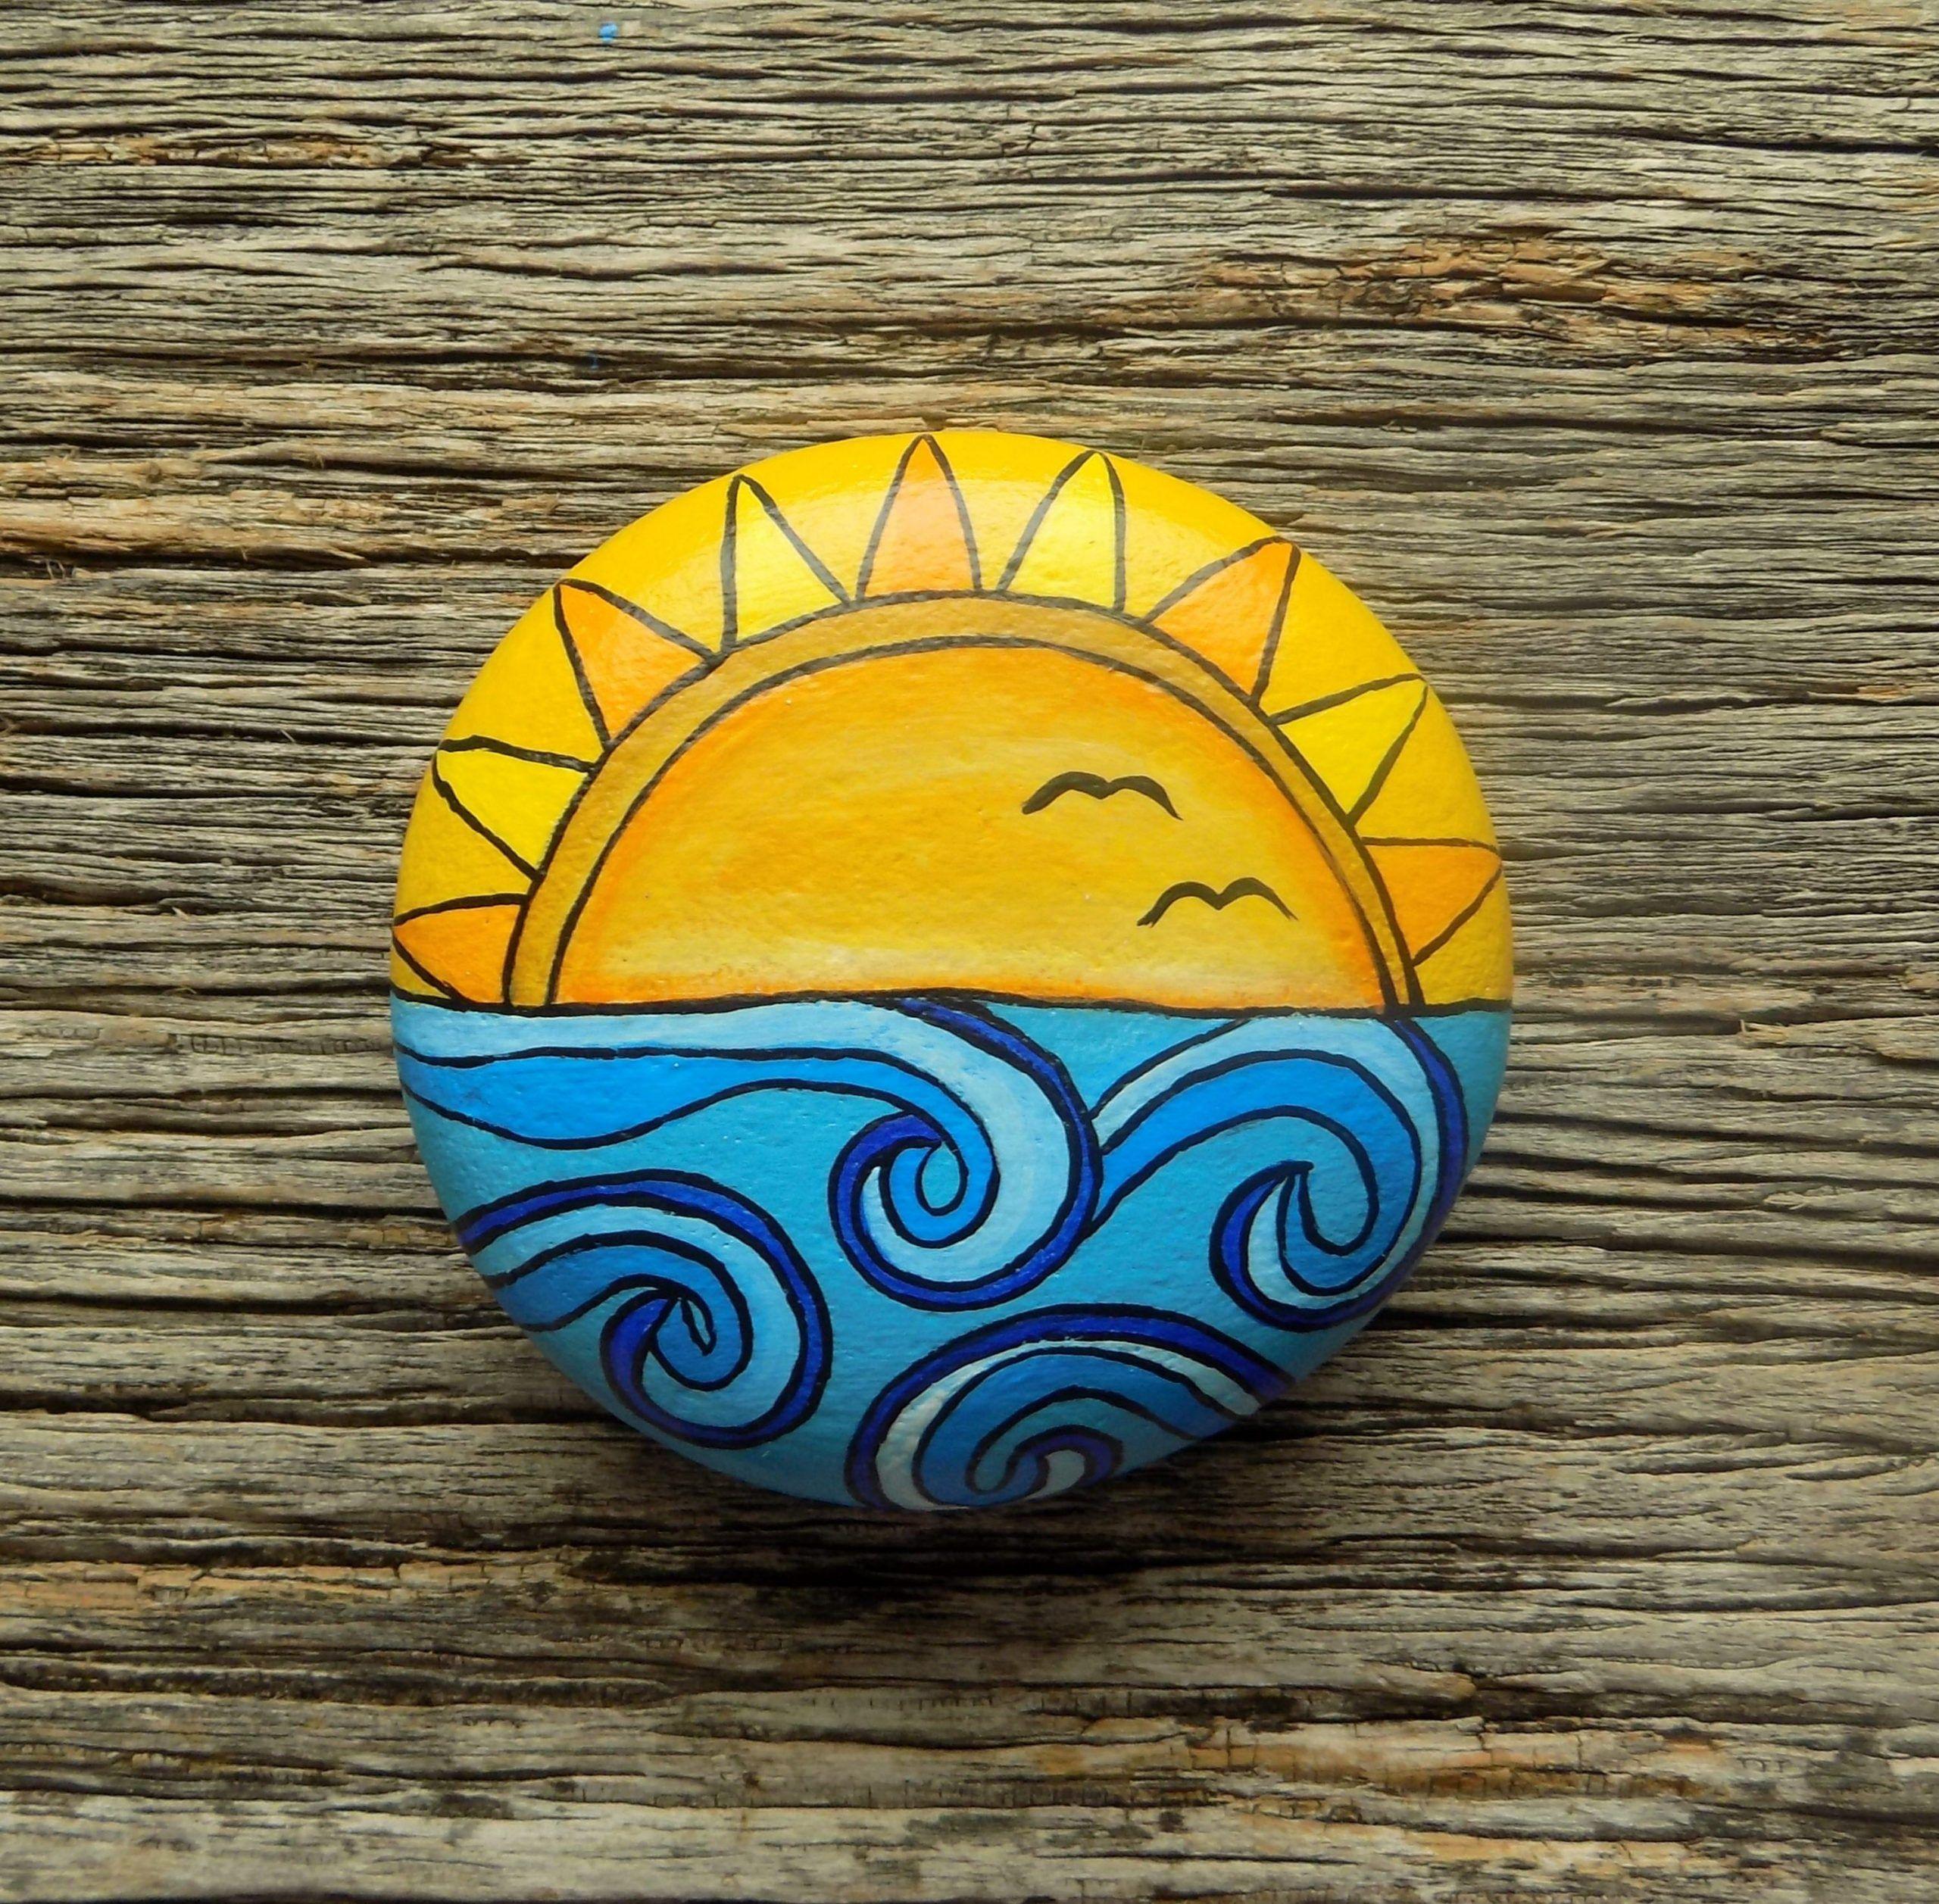 Ocean Sunset Painted Rock Decorative Accent Stone Paperweight Accent Decorative Ocean Paint Rock Painting Patterns Rock Painting Designs Rock Painting Art